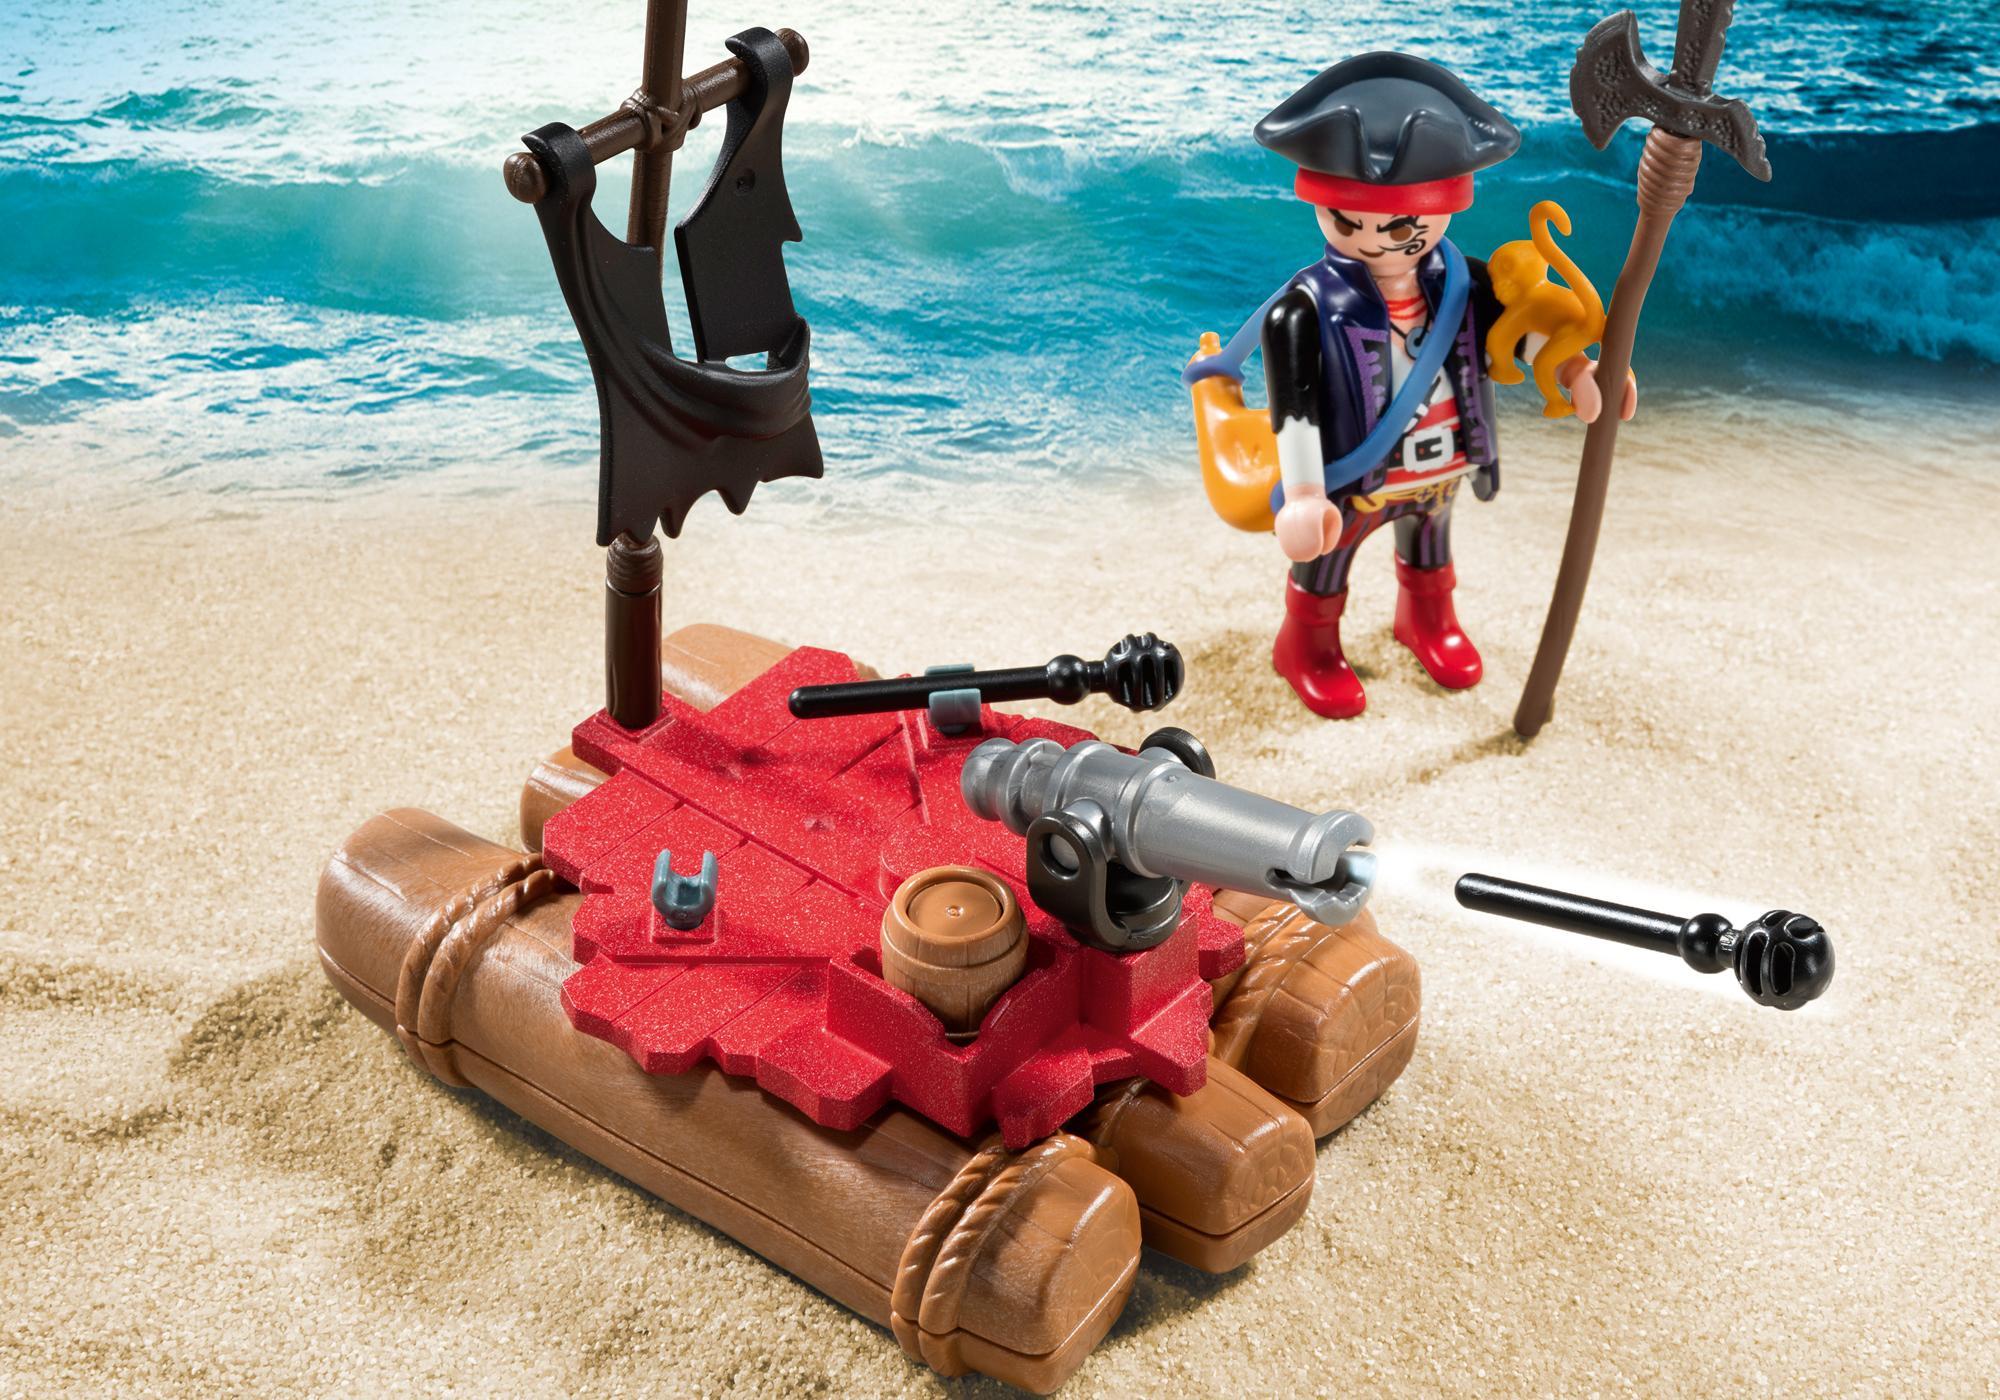 http://media.playmobil.com/i/playmobil/5655_product_extra1/Pirate Raft Carry Case